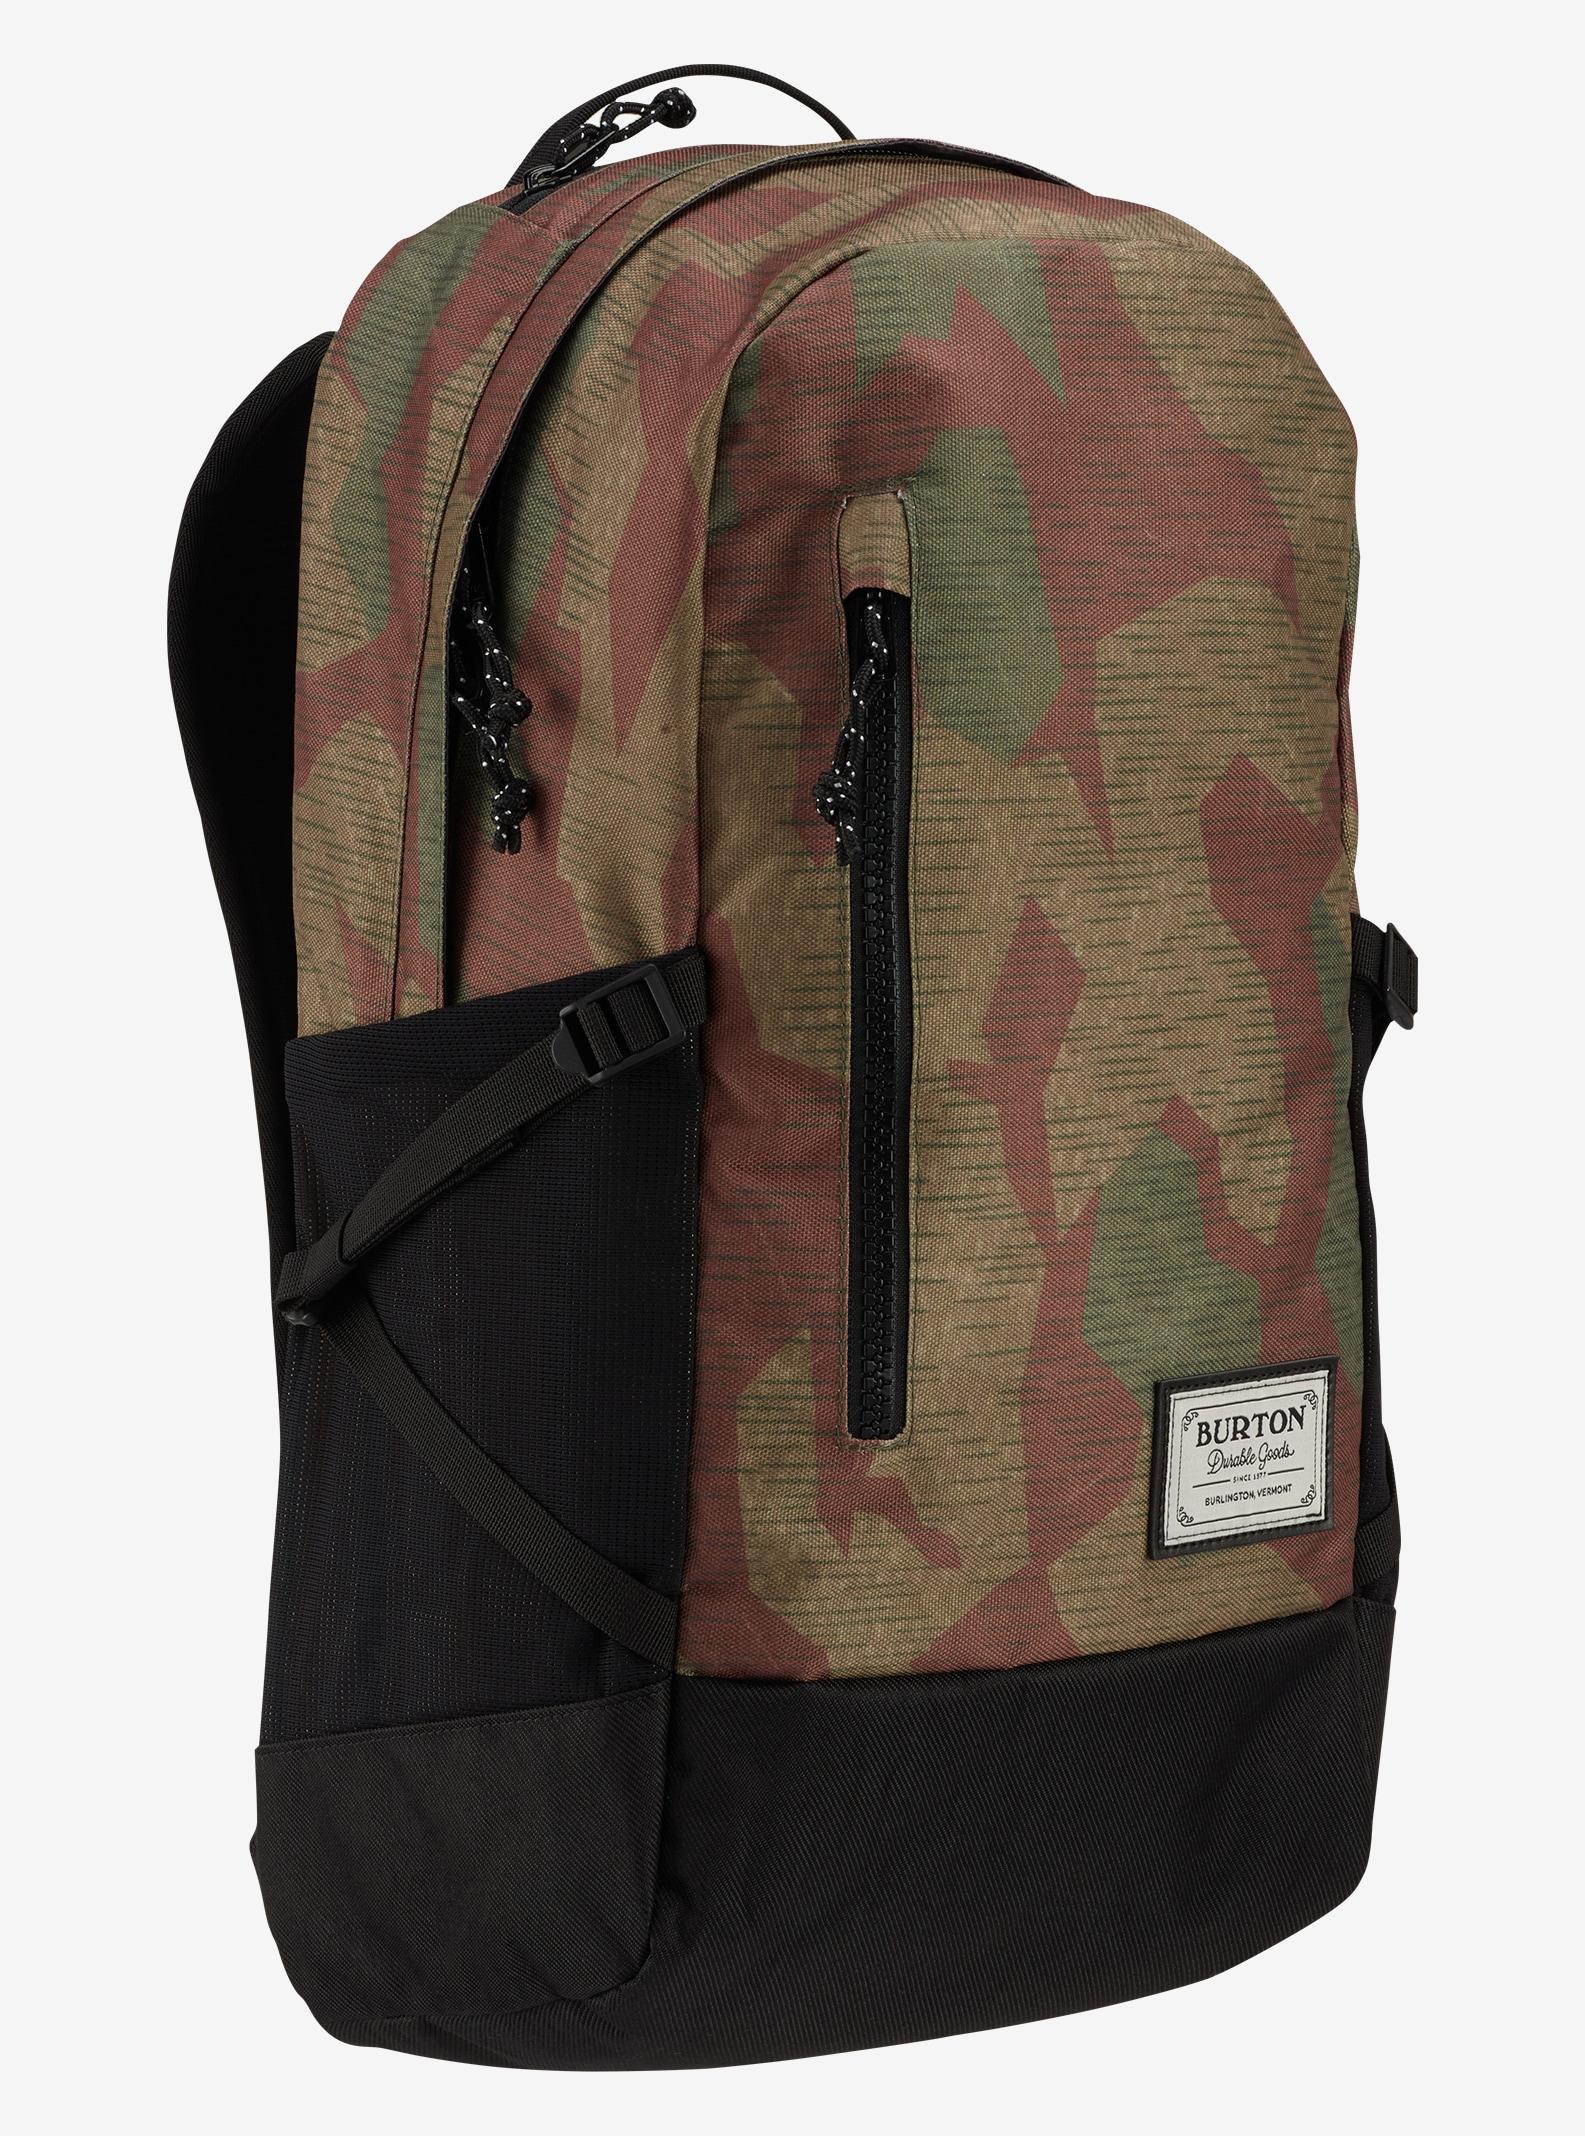 Burton Prospect Backpack shown in Splinter Camo Print